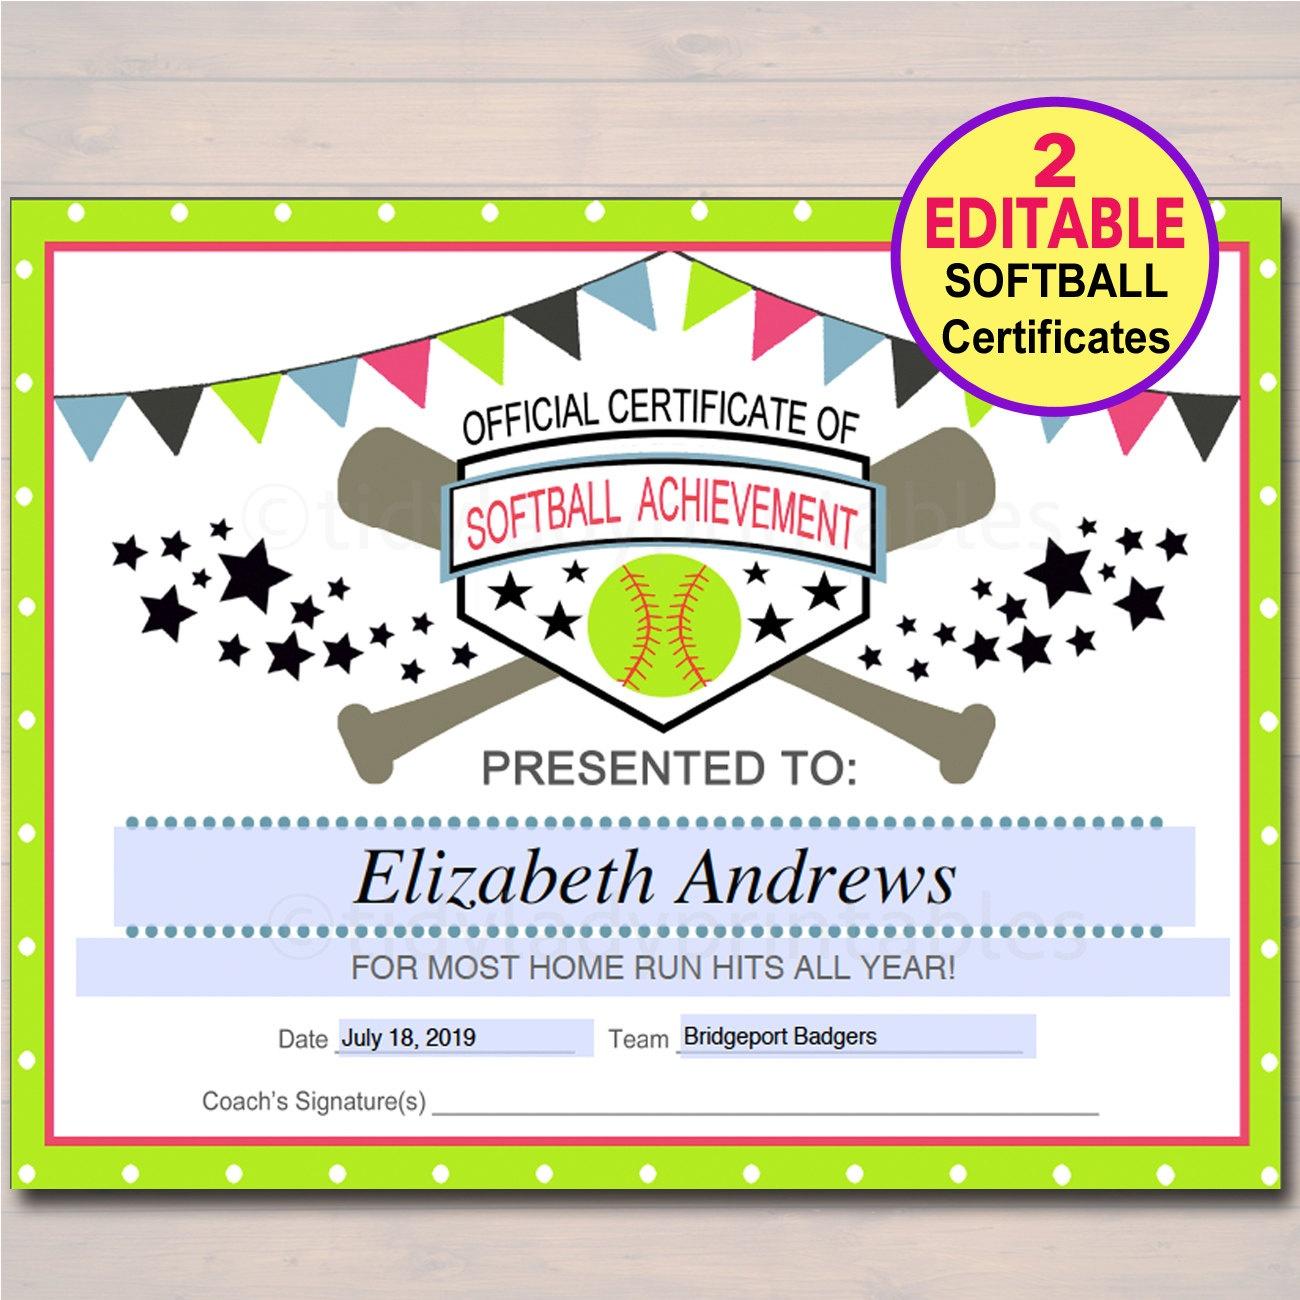 Editable Softball Certificates Instant Download Softball | Etsy - Free Printable Softball Award Certificates